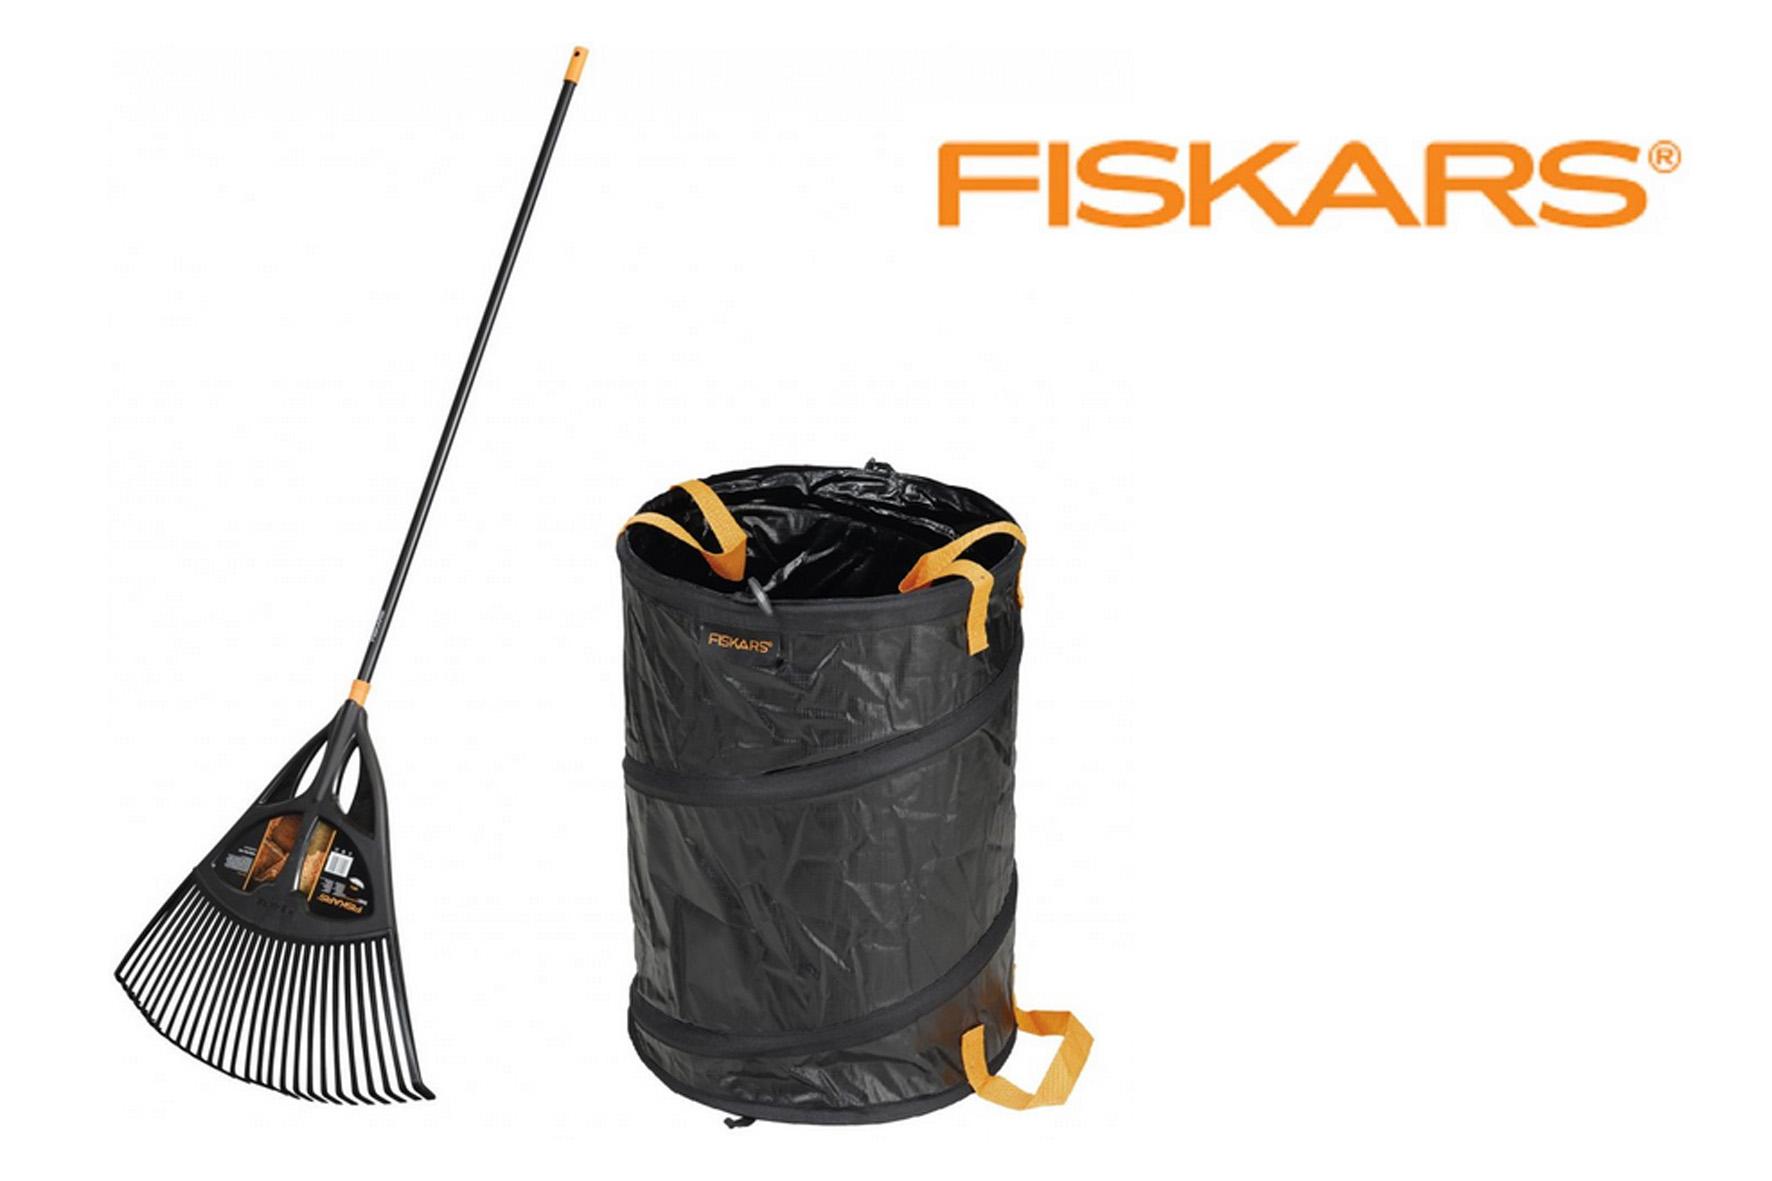 Balai xl manche metal fiskars sac de jardin achat en for Outillage de jardin fiskars